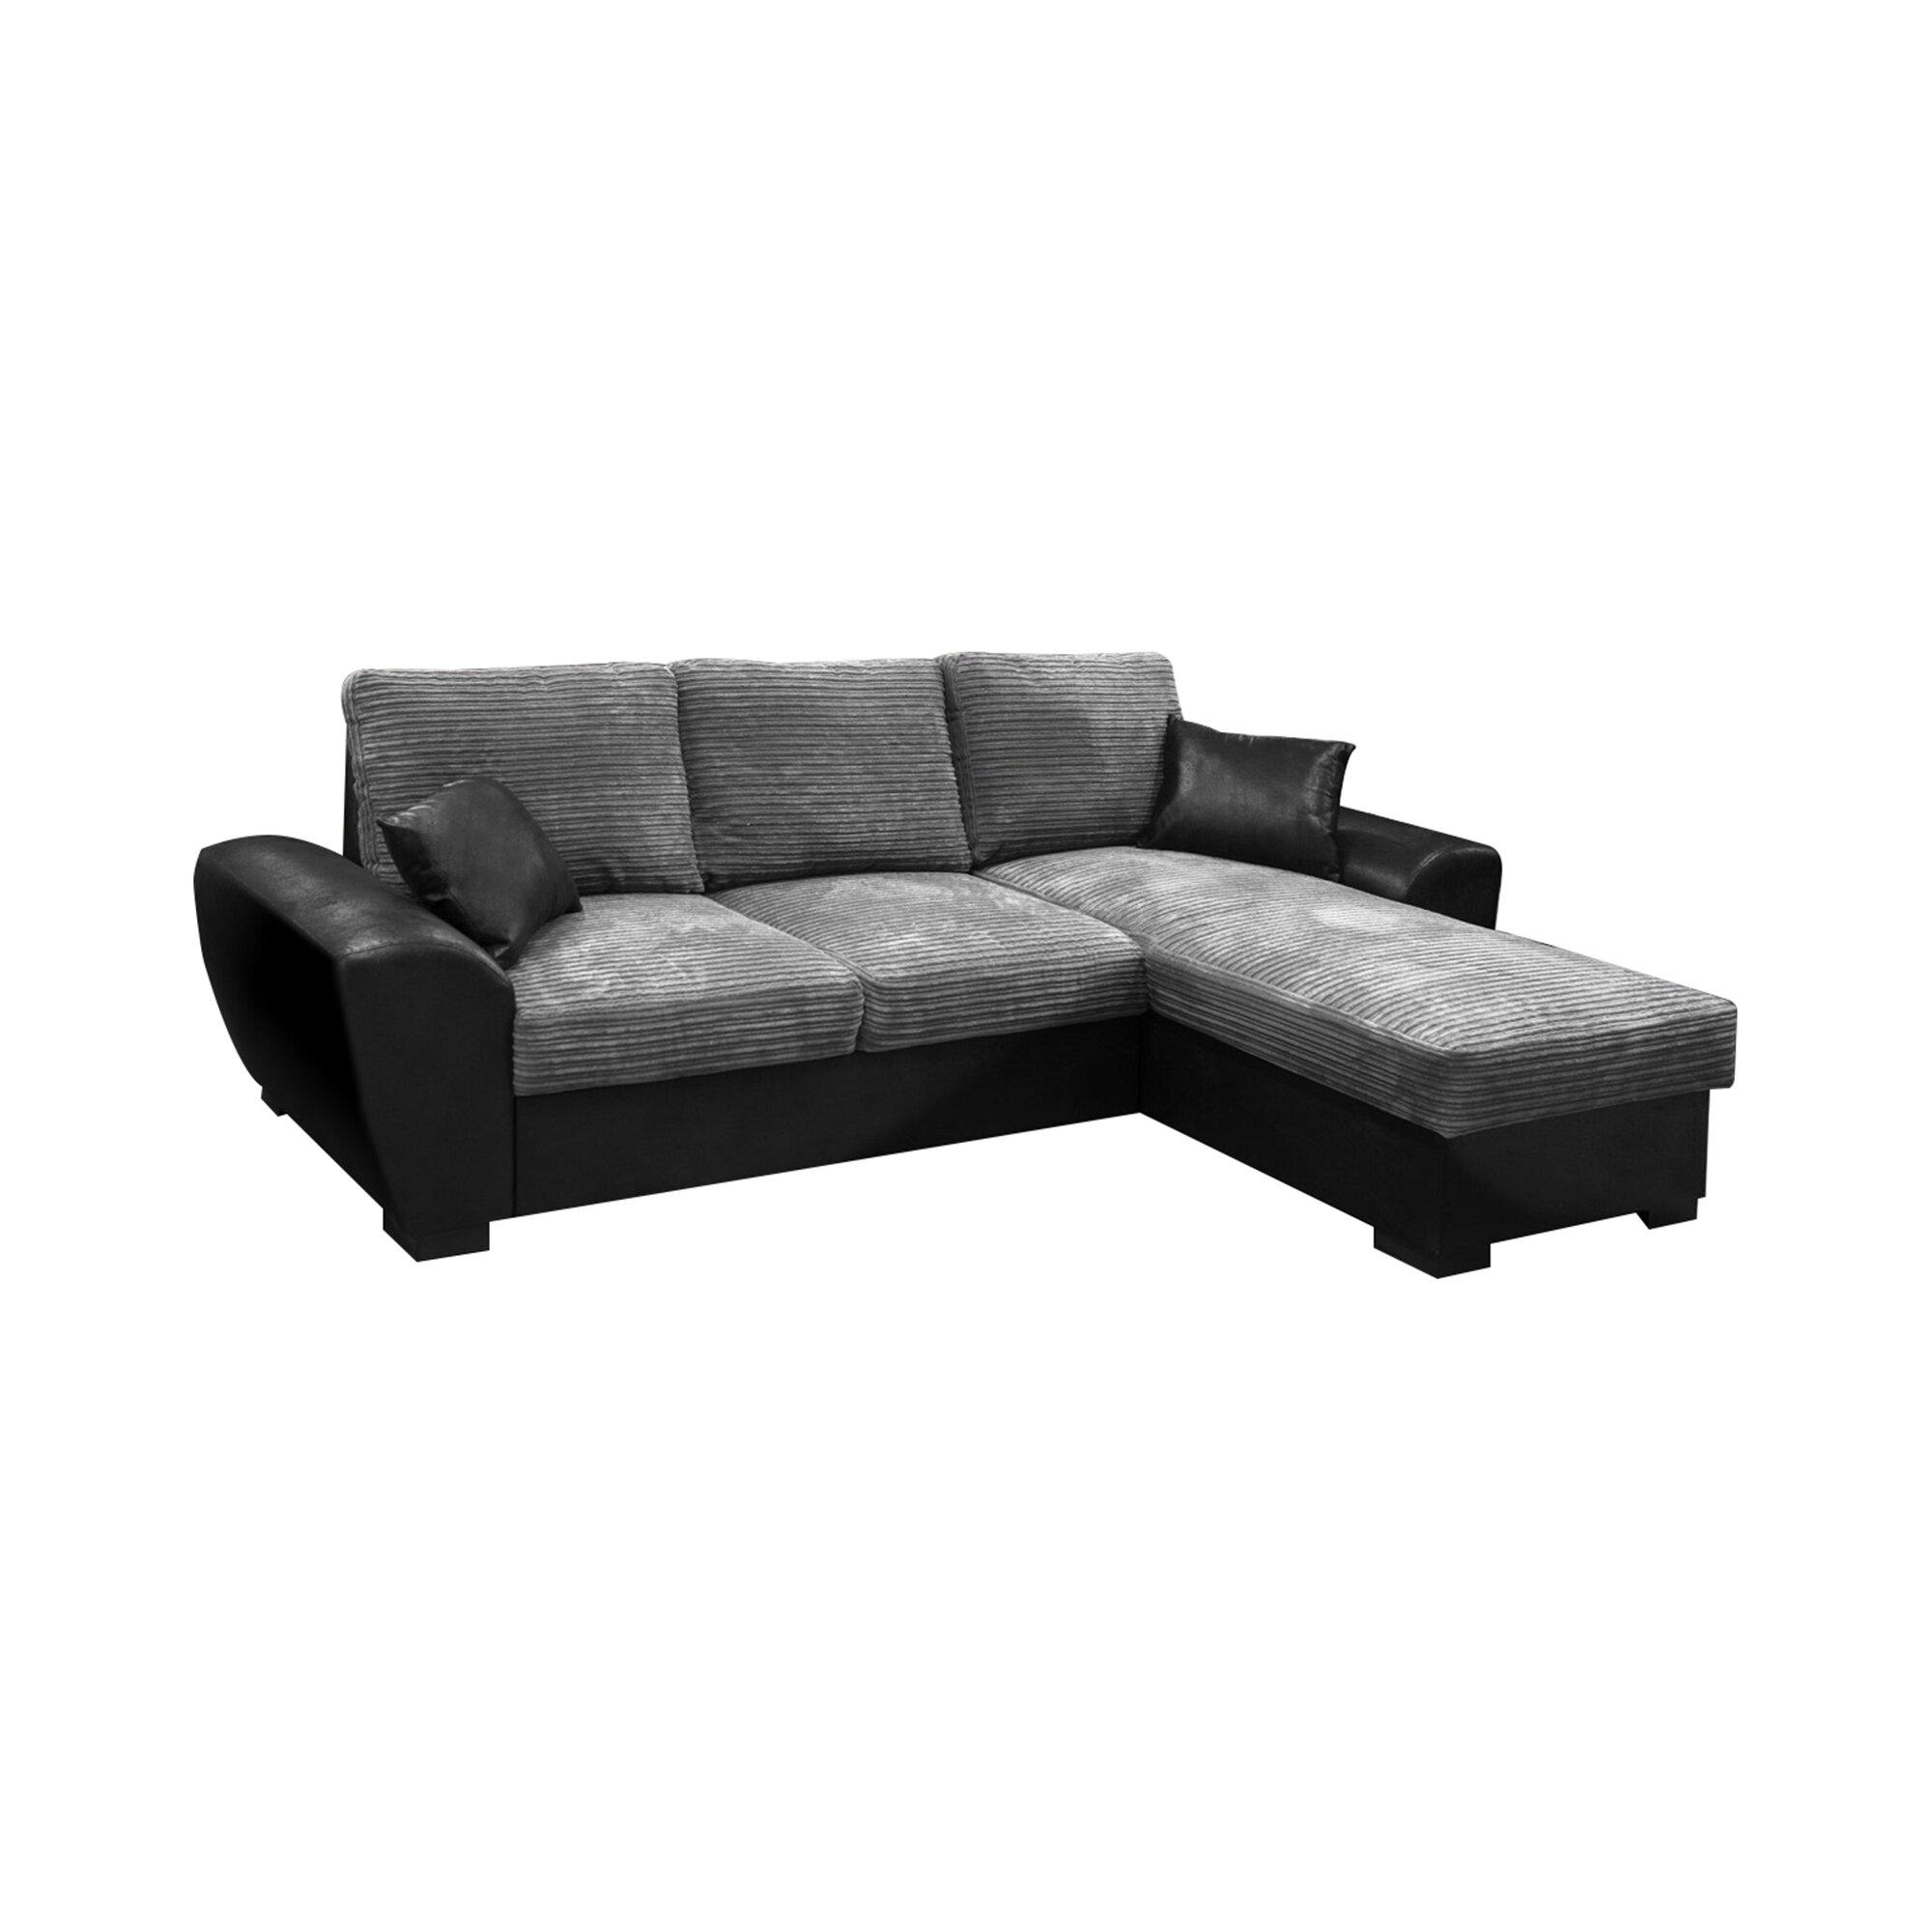 quality design ade0a 3720e Gianni Reversible Sleeper Corner Sofa Bed